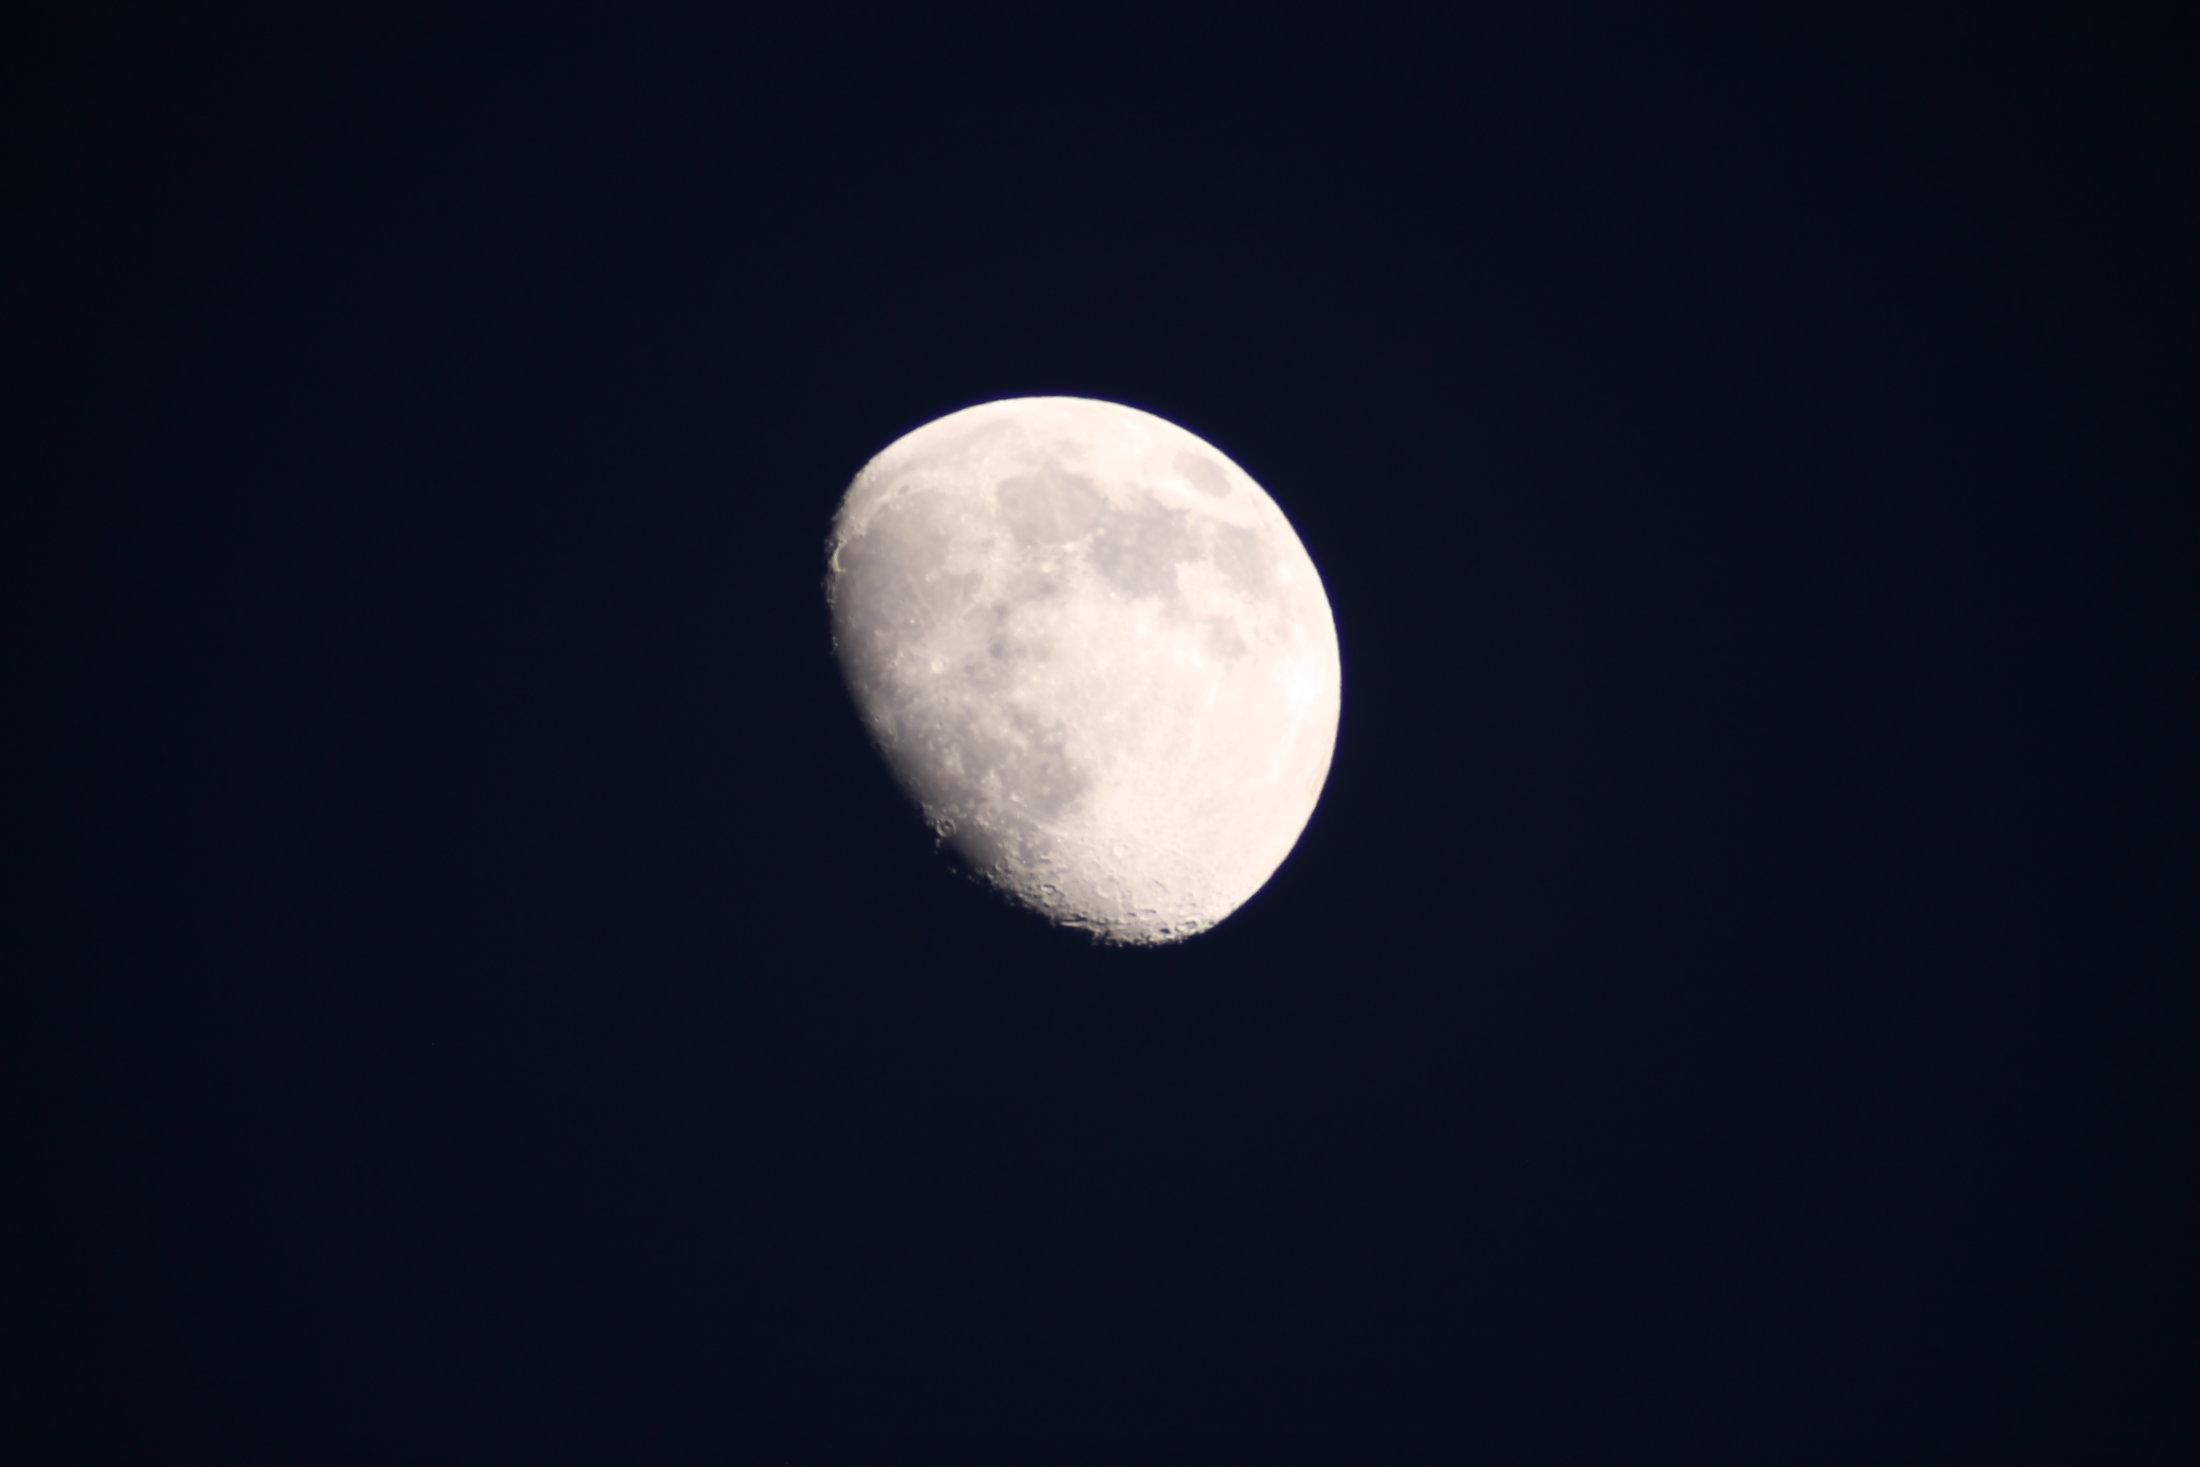 Lluna - Jaime Pla